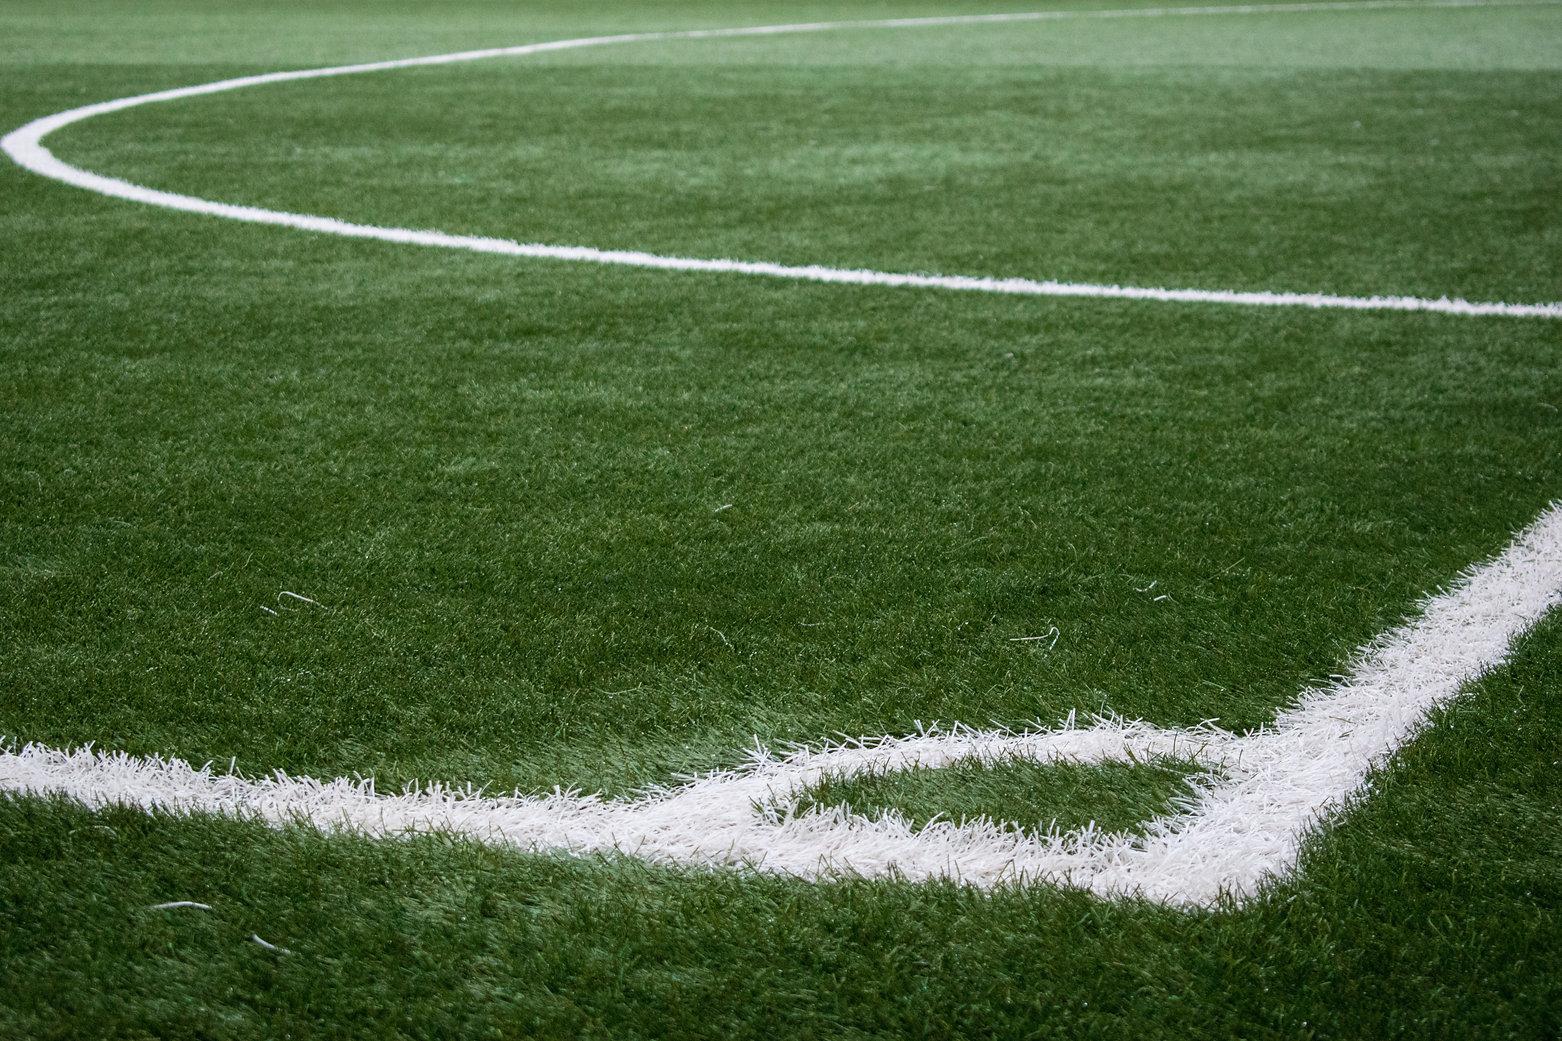 Soccer-Field-Background.jpg